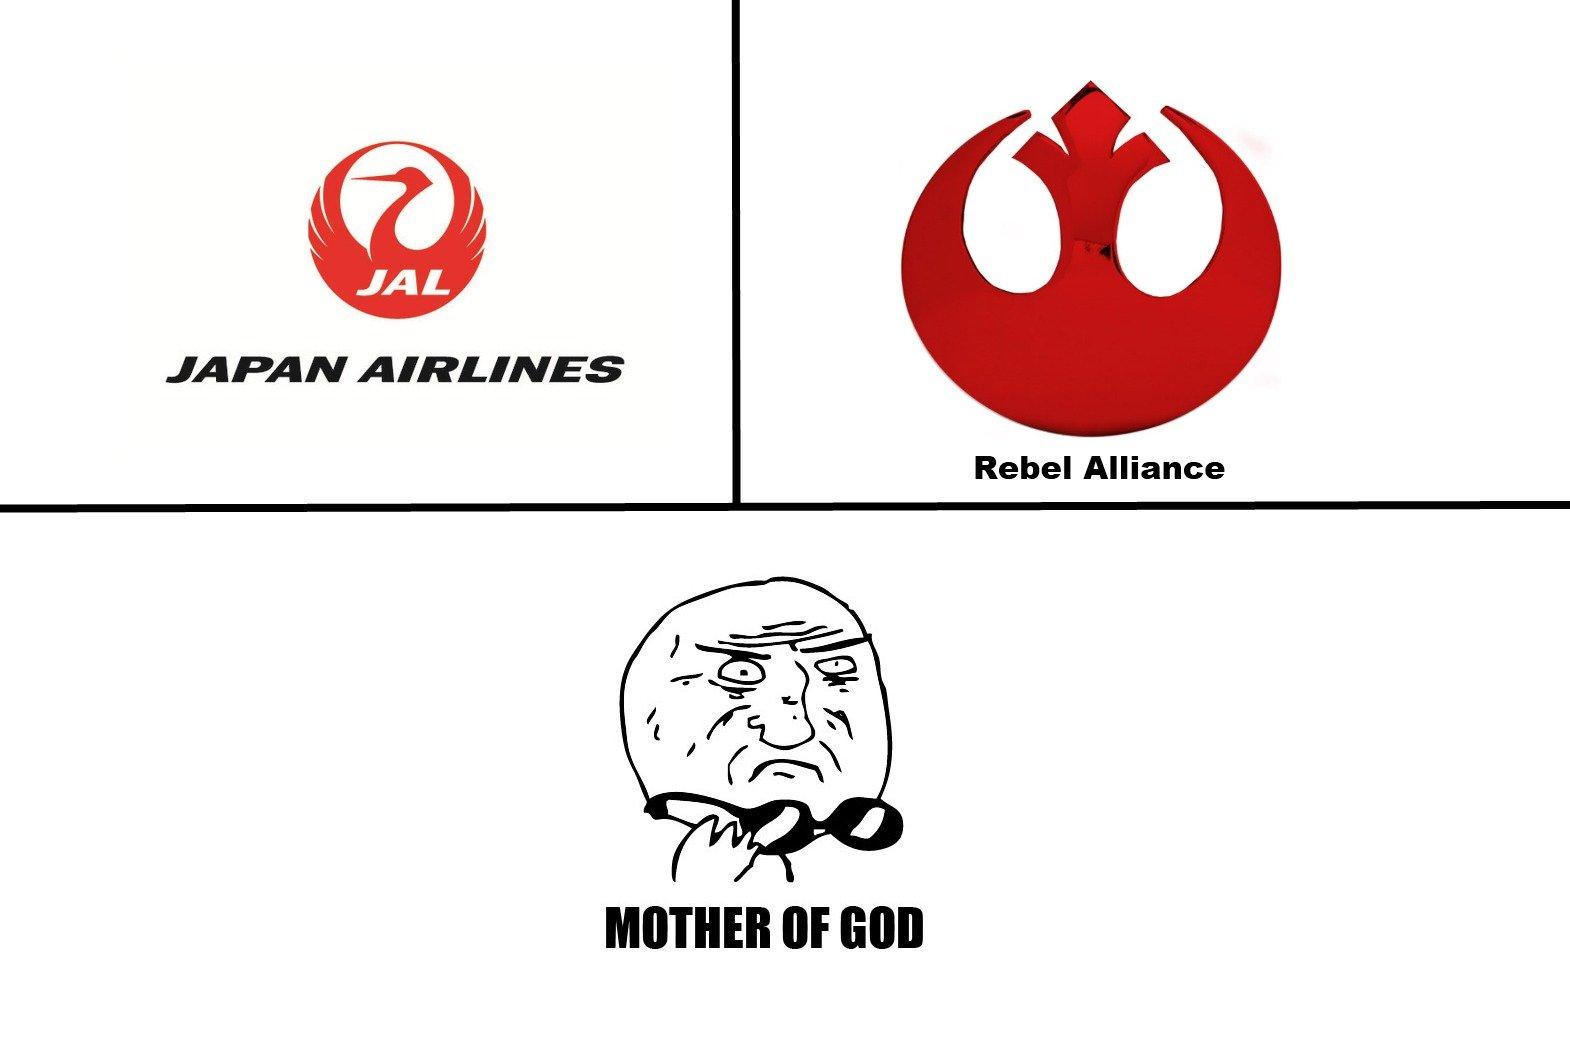 Japan Airlines Vs Rebel Alliance